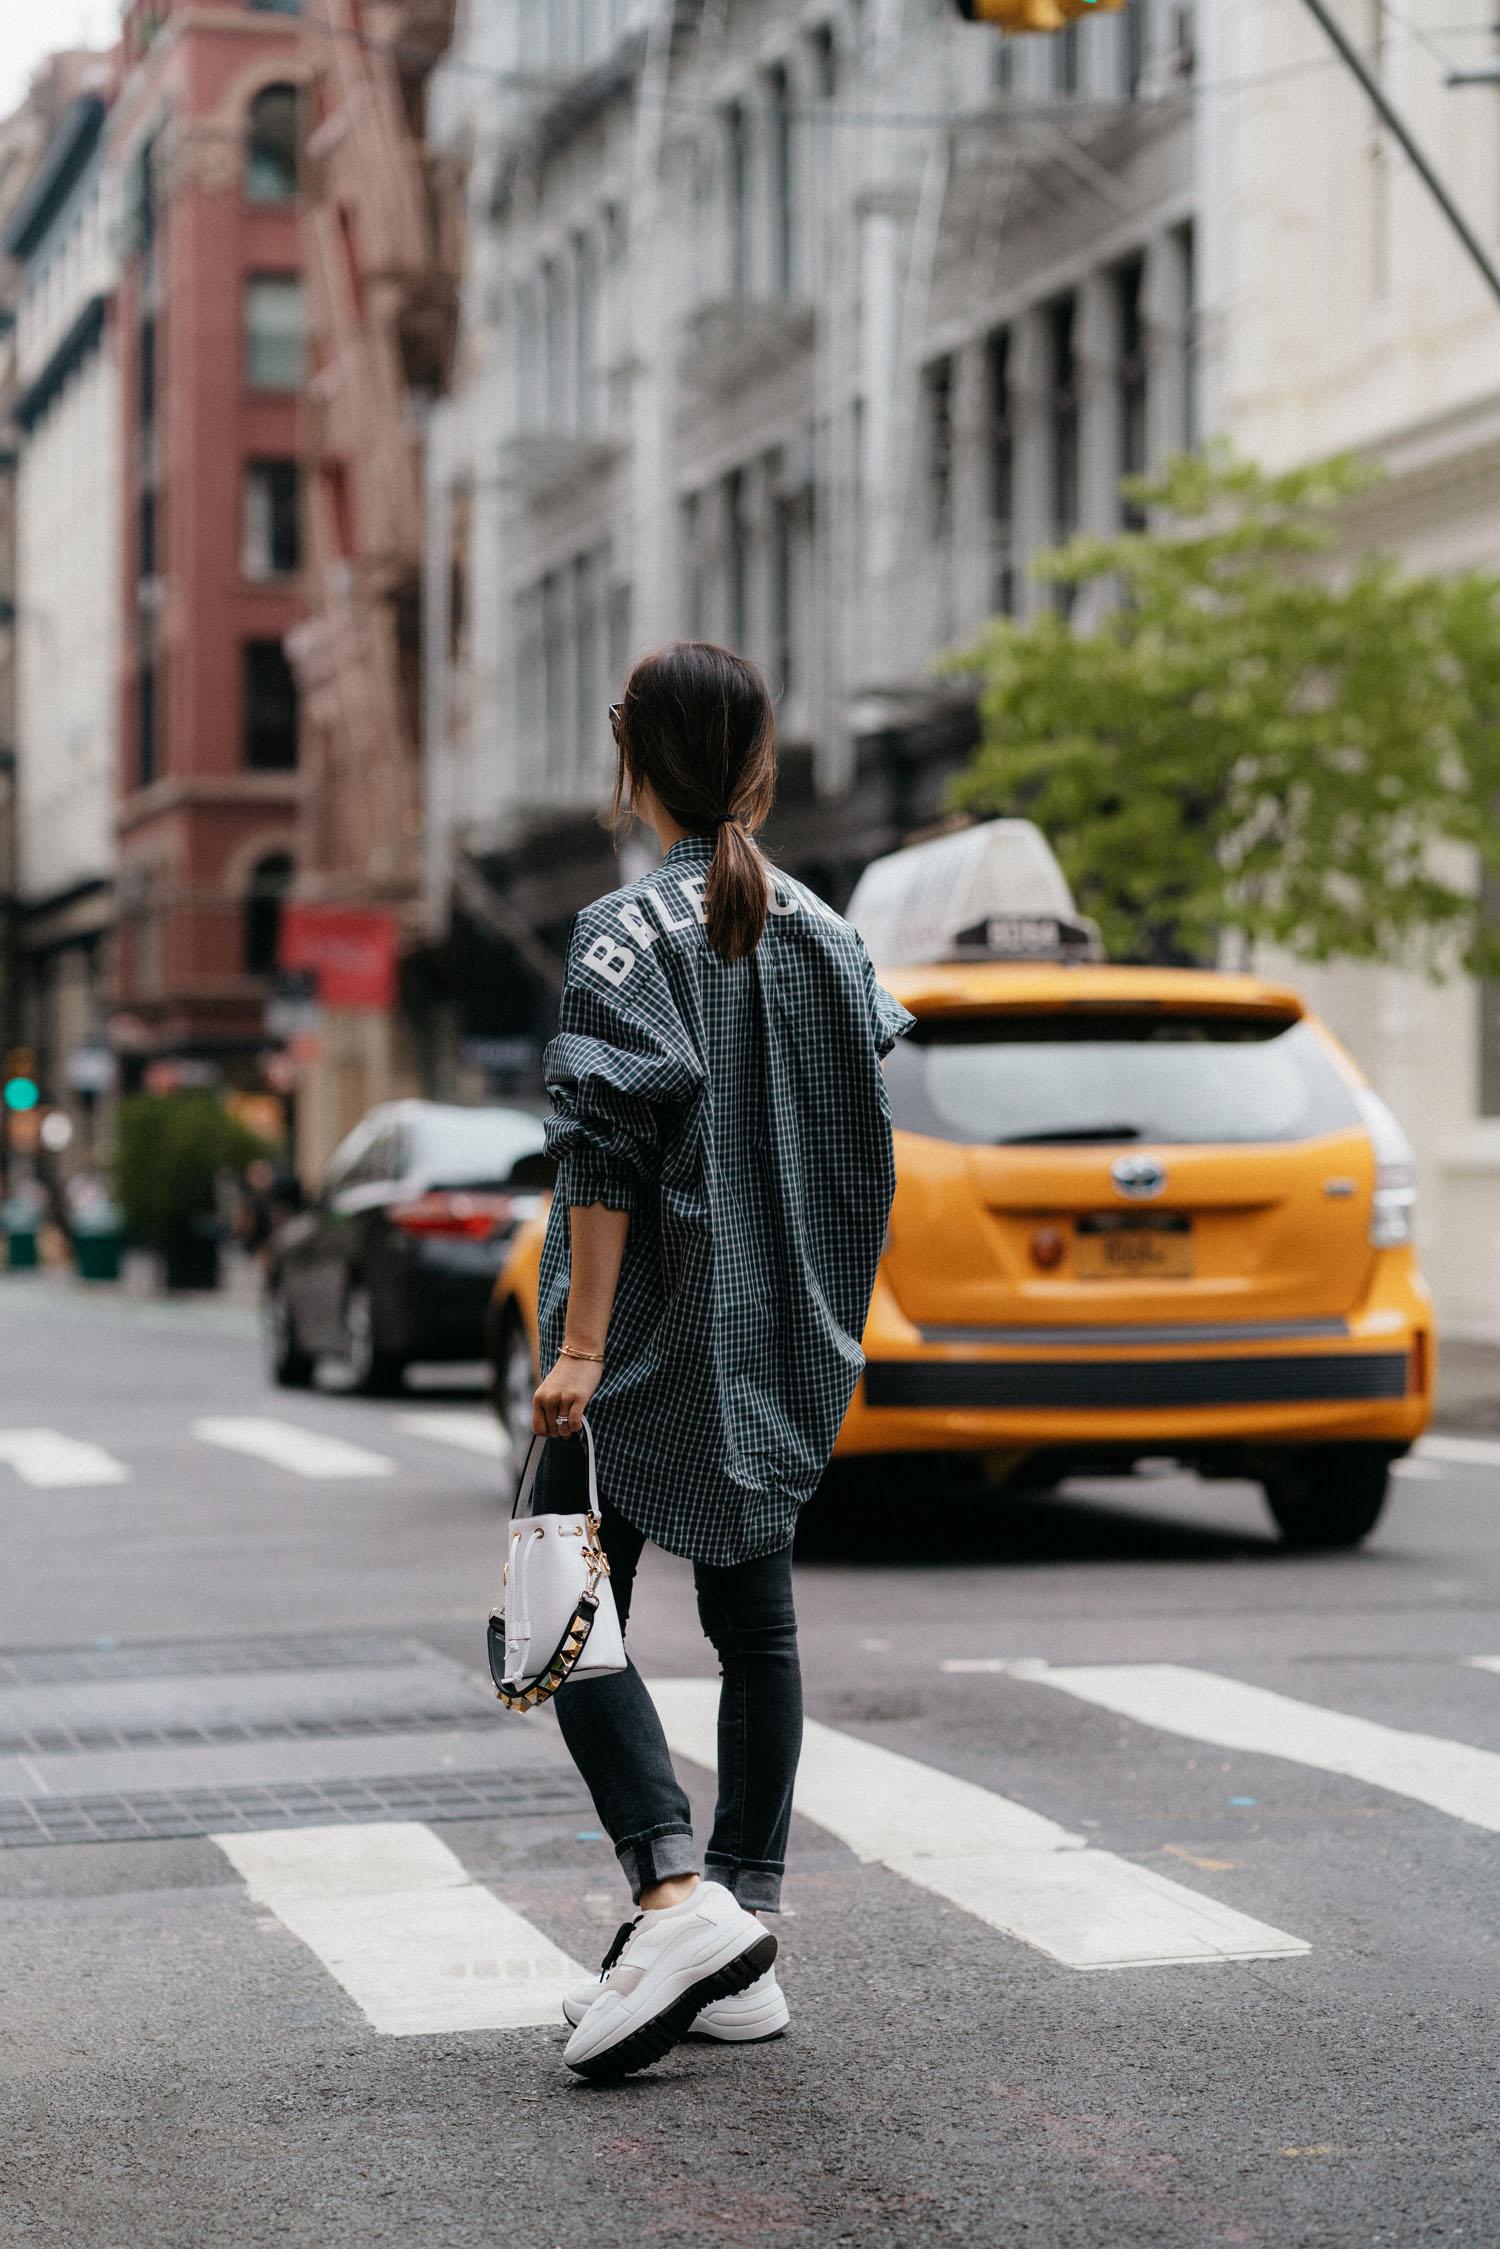 Balenciaga Top ,  R13 Denim , Céline Sneakers,  Fendi Bag